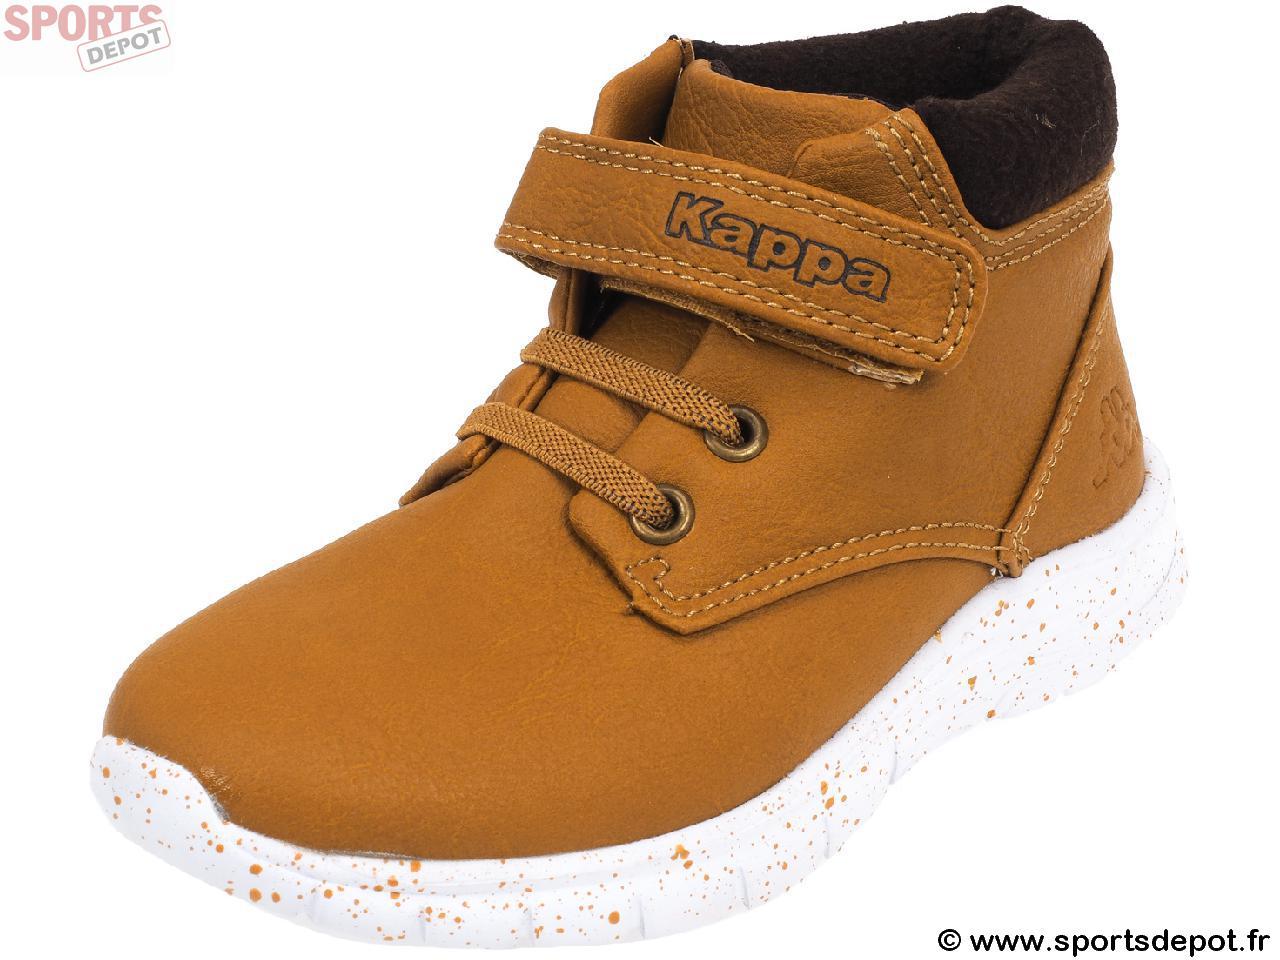 18f14a42c0eee Acheter Chaussures mid mi montantes KAPPA Cit bb tan marron baby ...